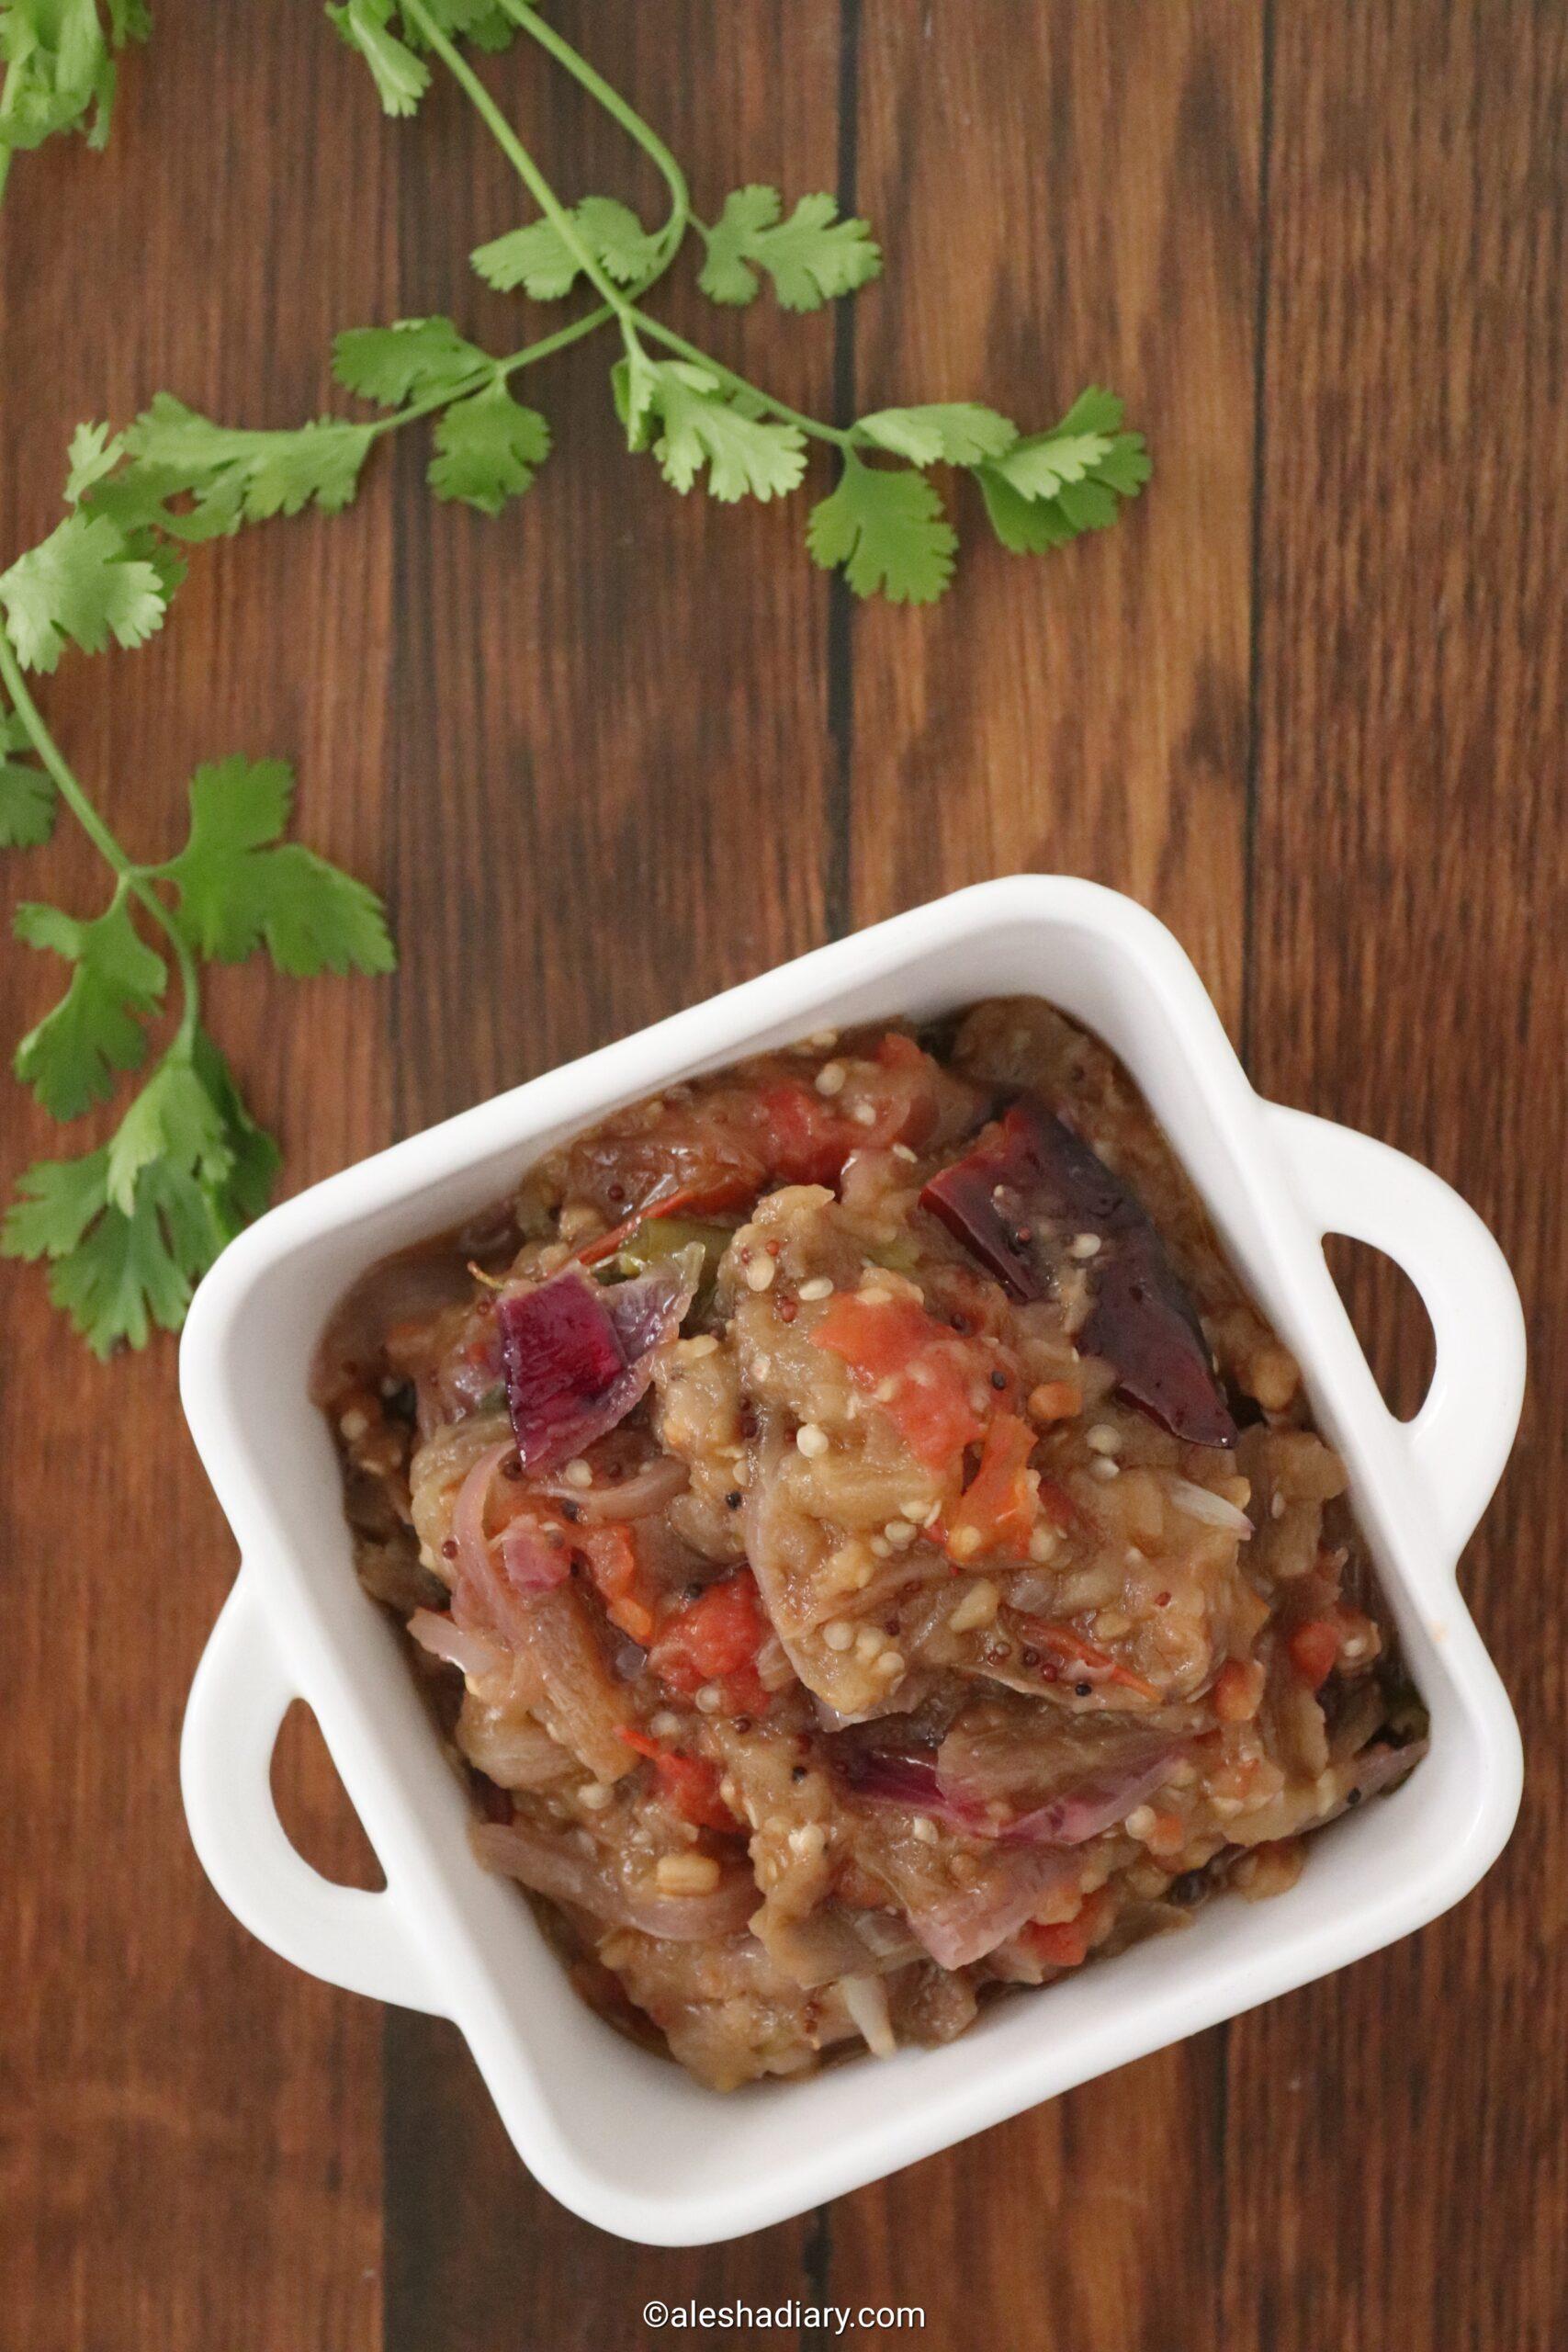 Kathrikai Kadaiyal – Mashed brinjal curry